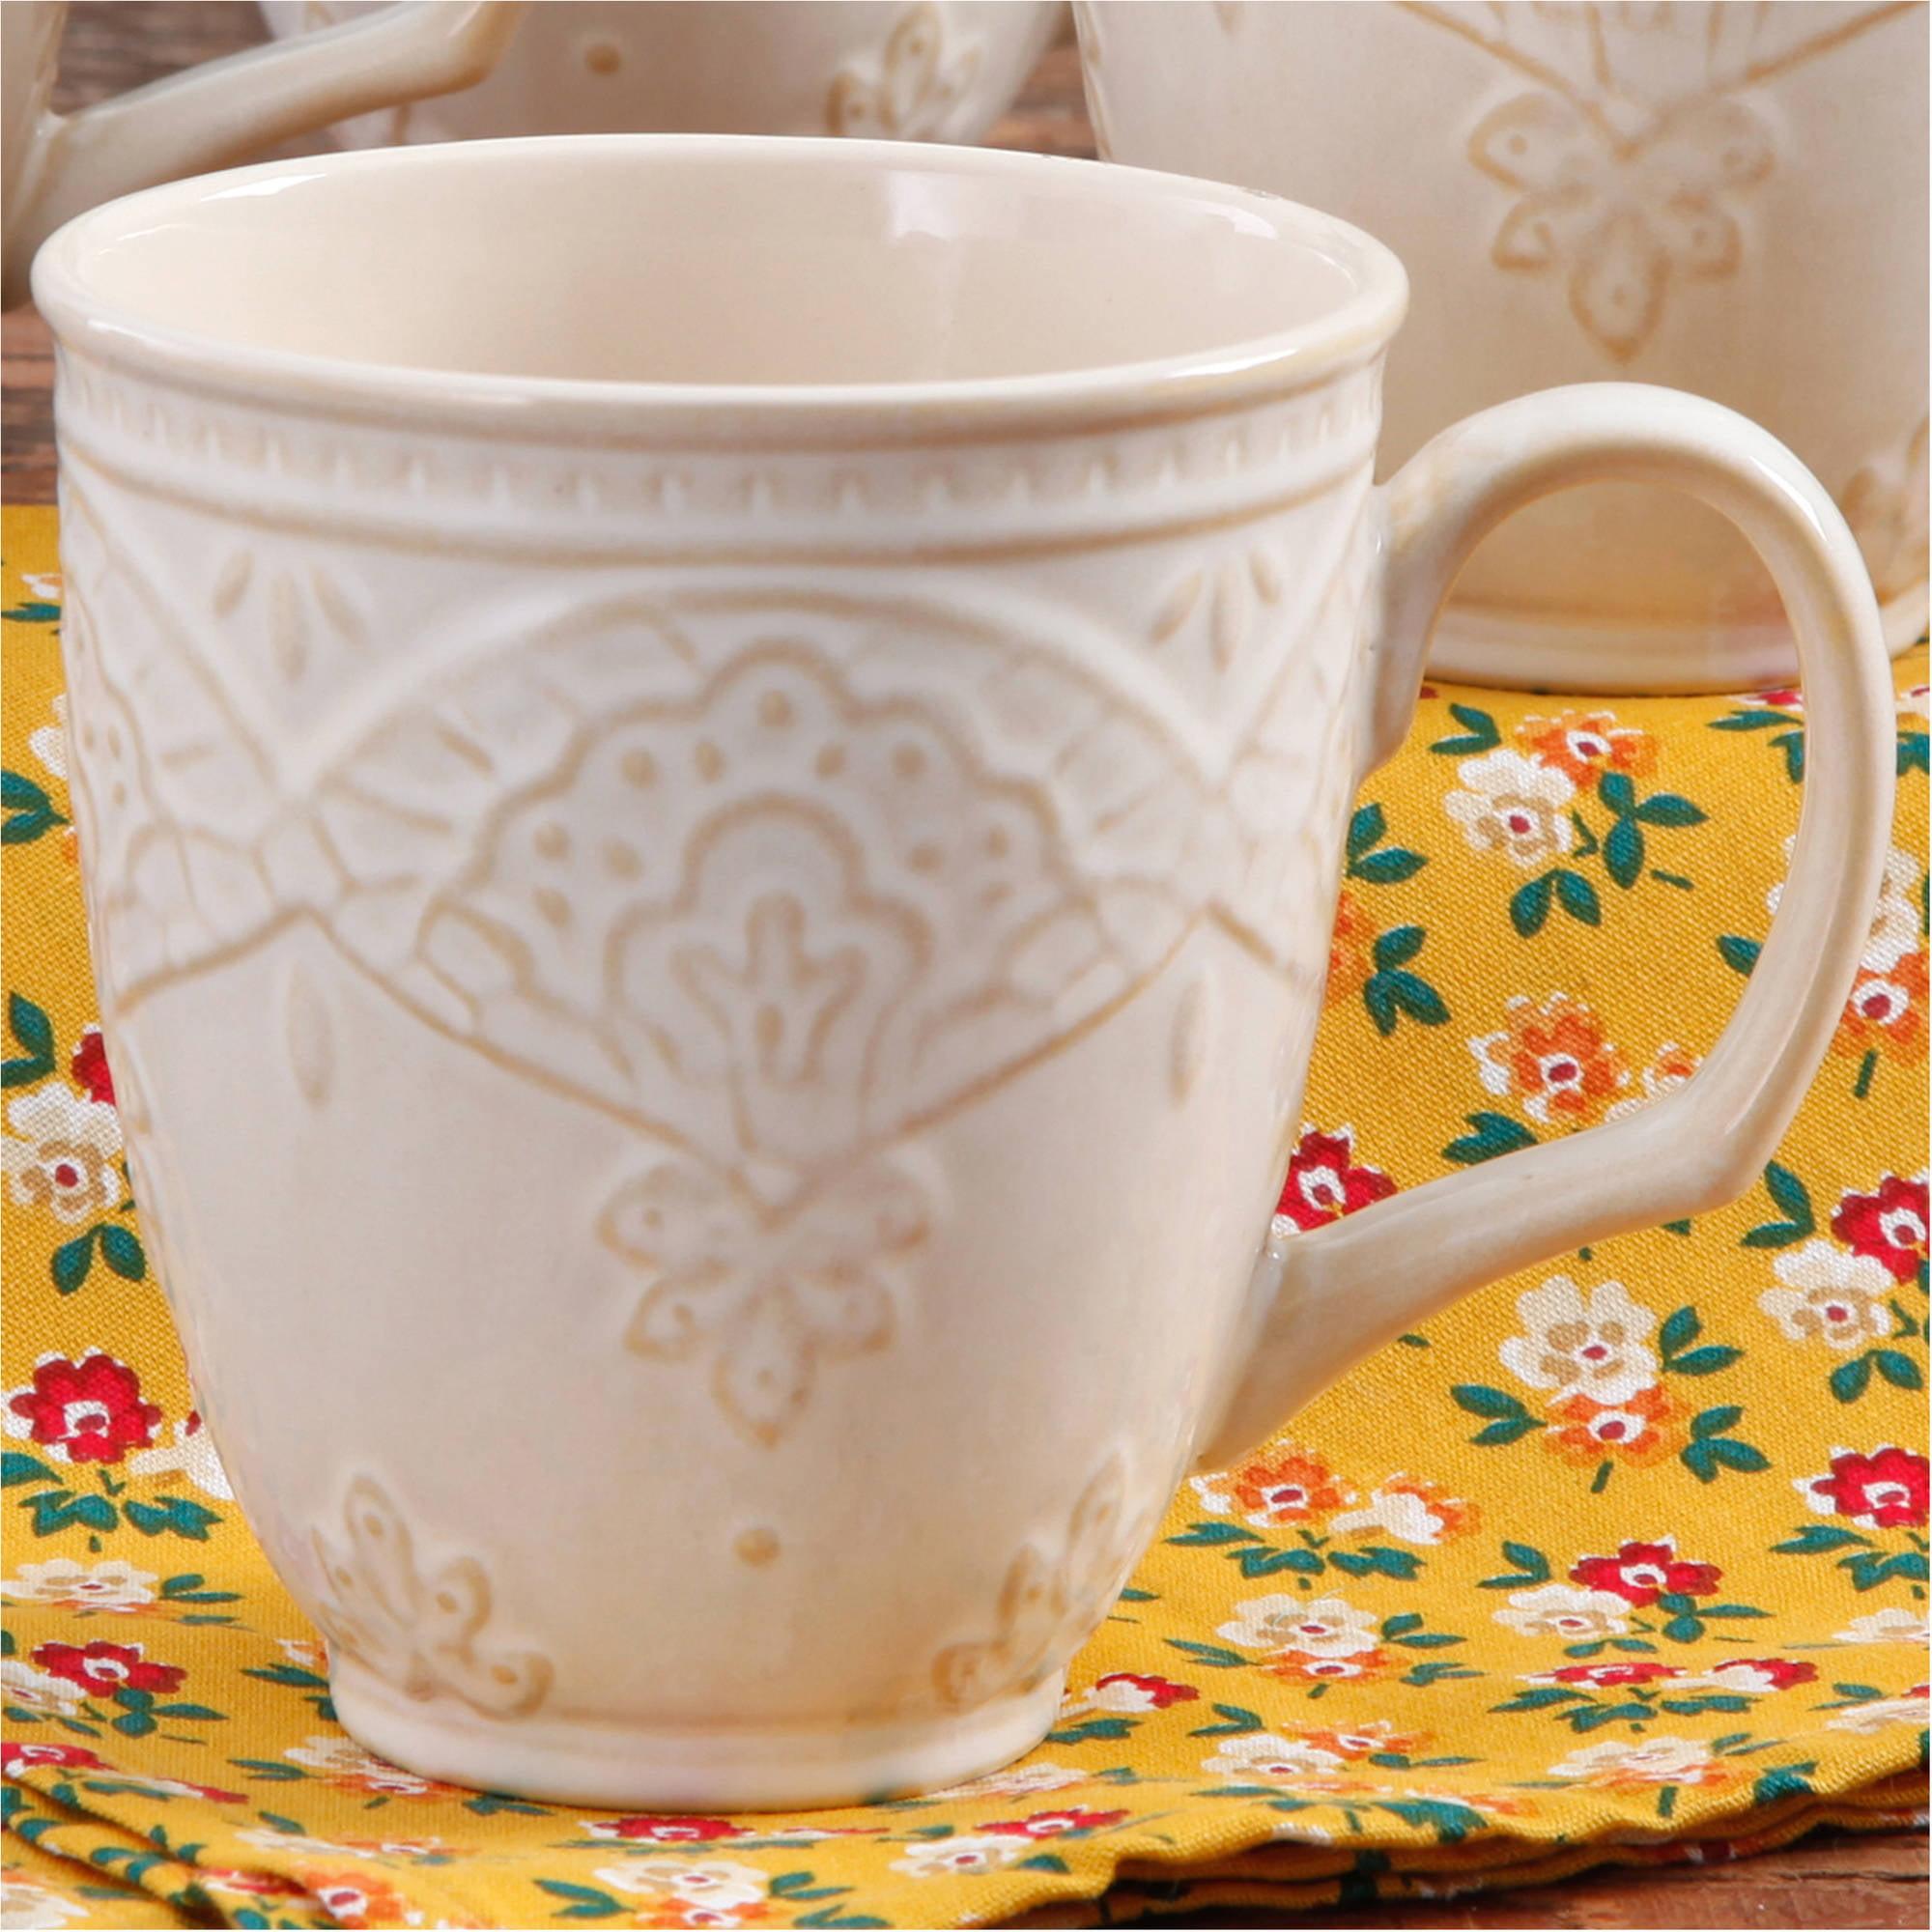 The Pioneer Woman Farmhouse Lace 17-Ounce Mug